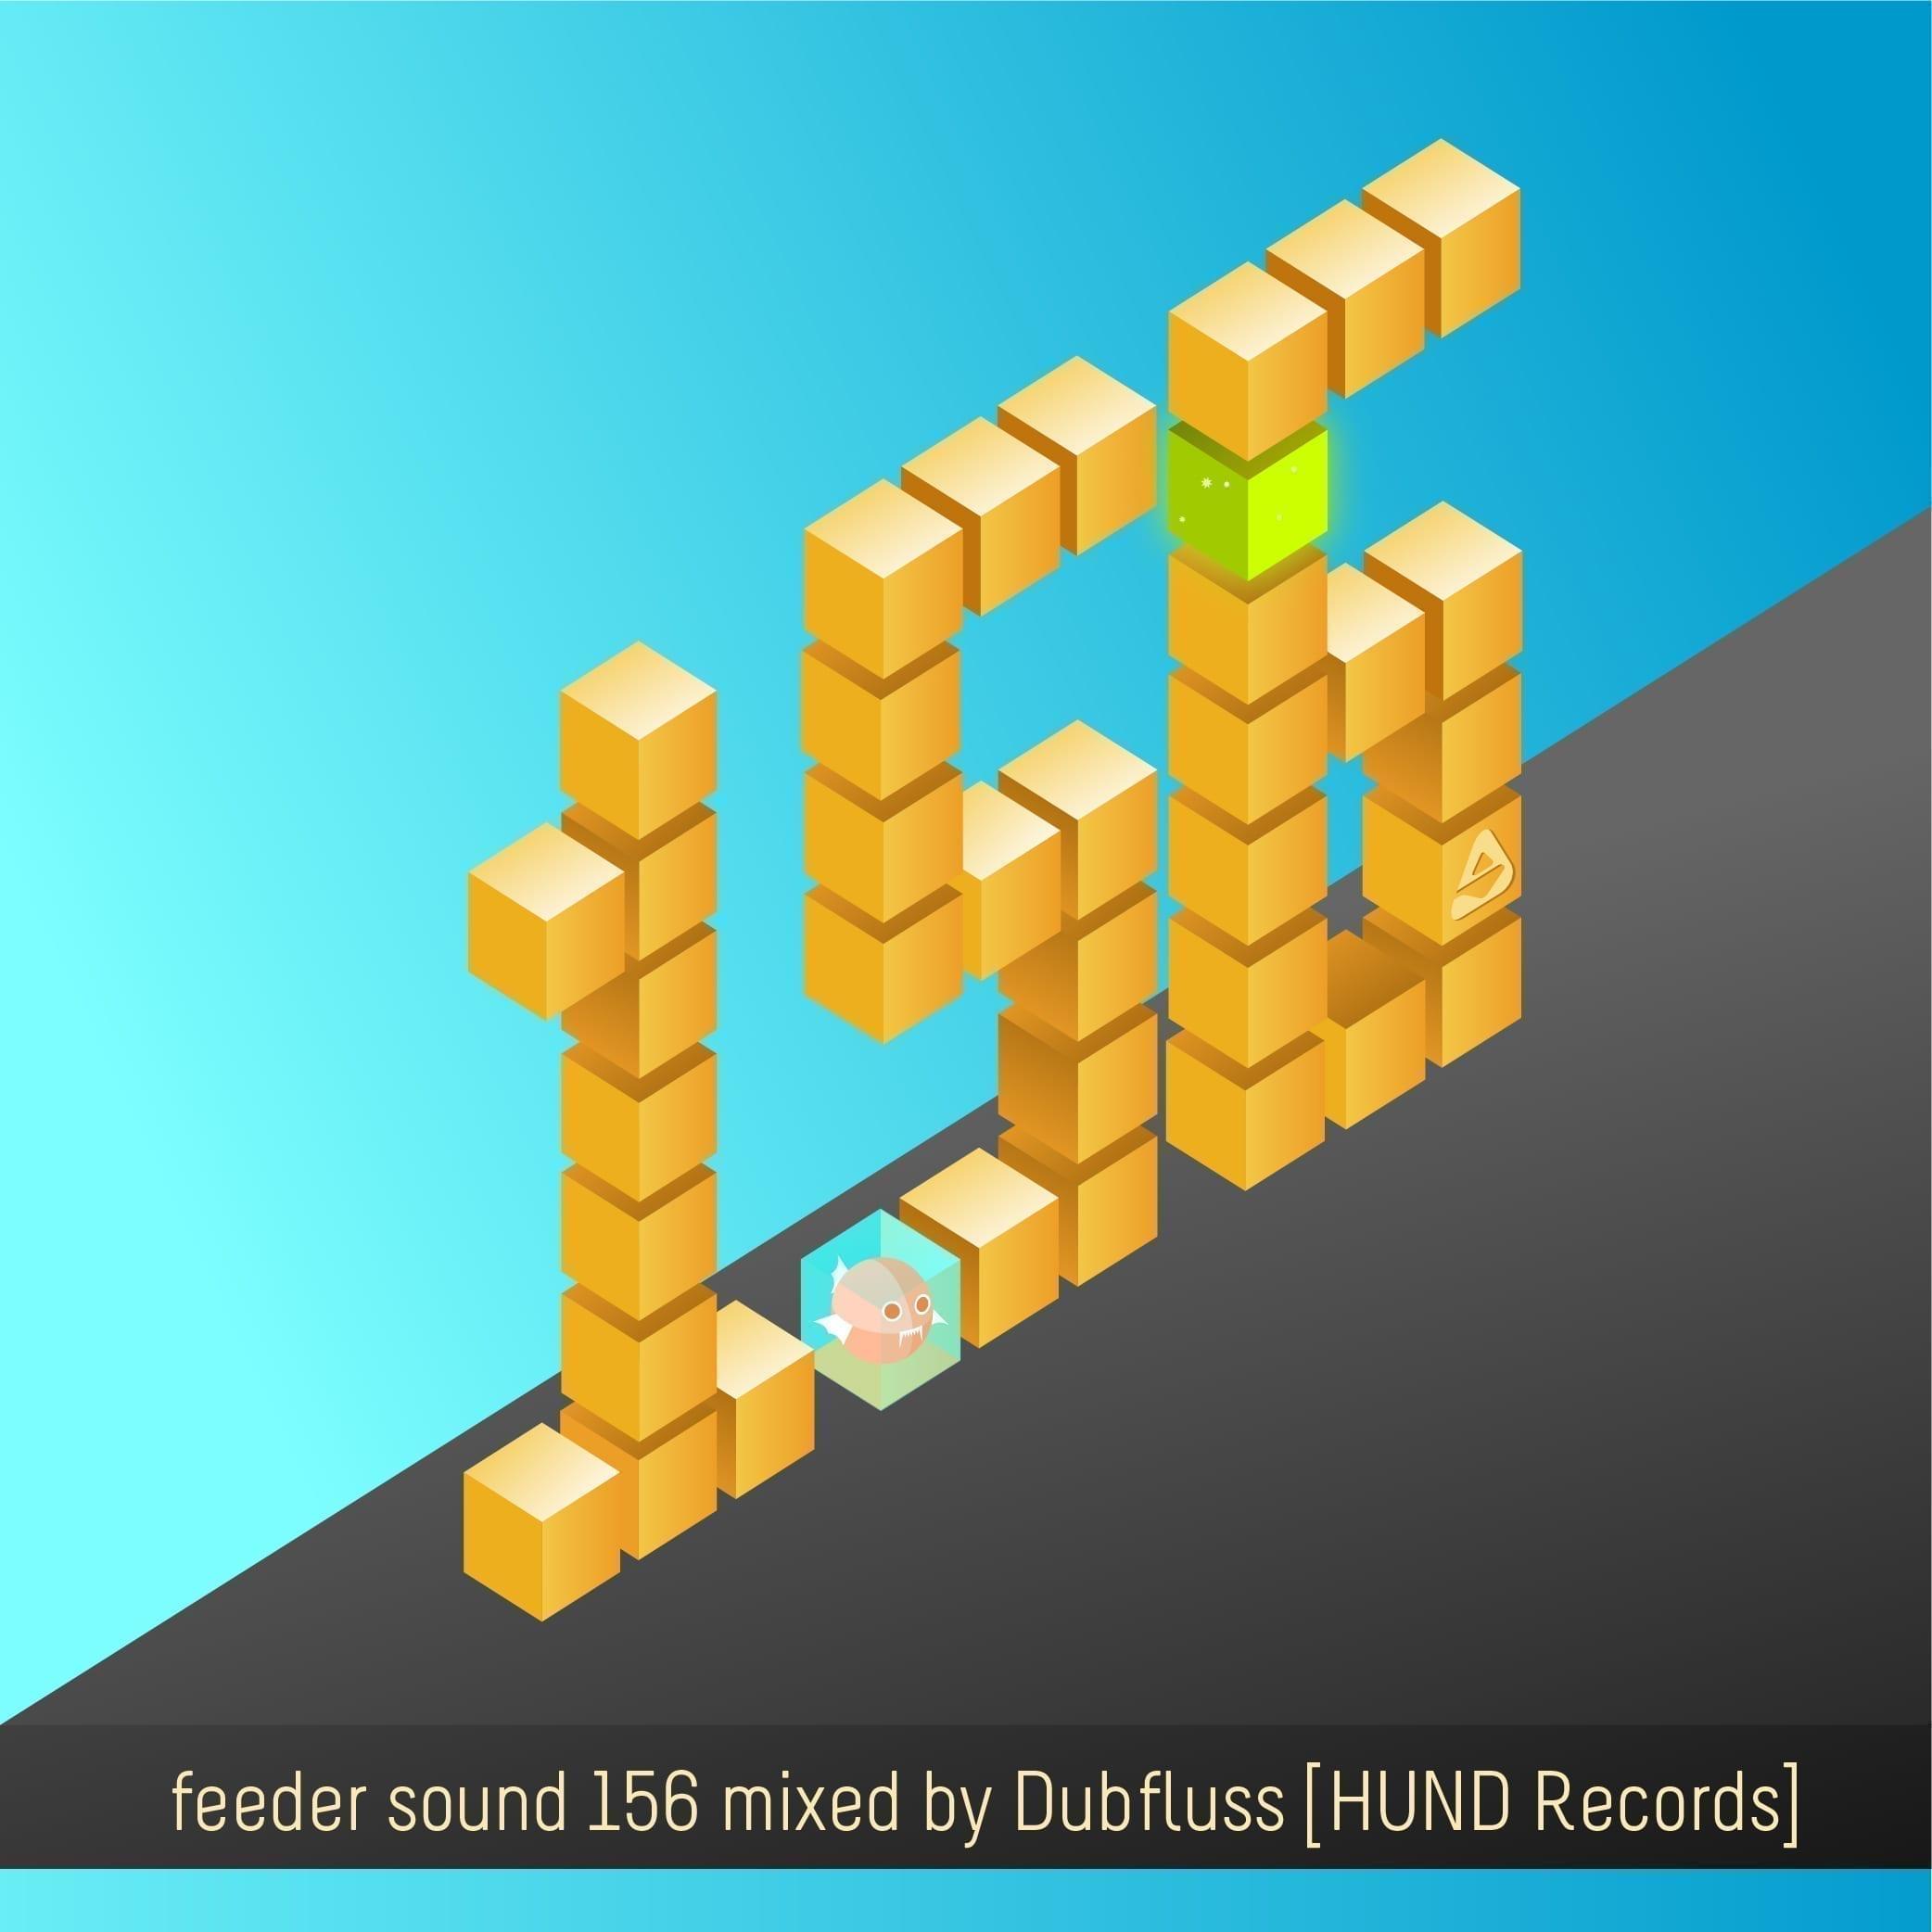 feeder sound 156 mixed by Dubfluss [HUND Records]